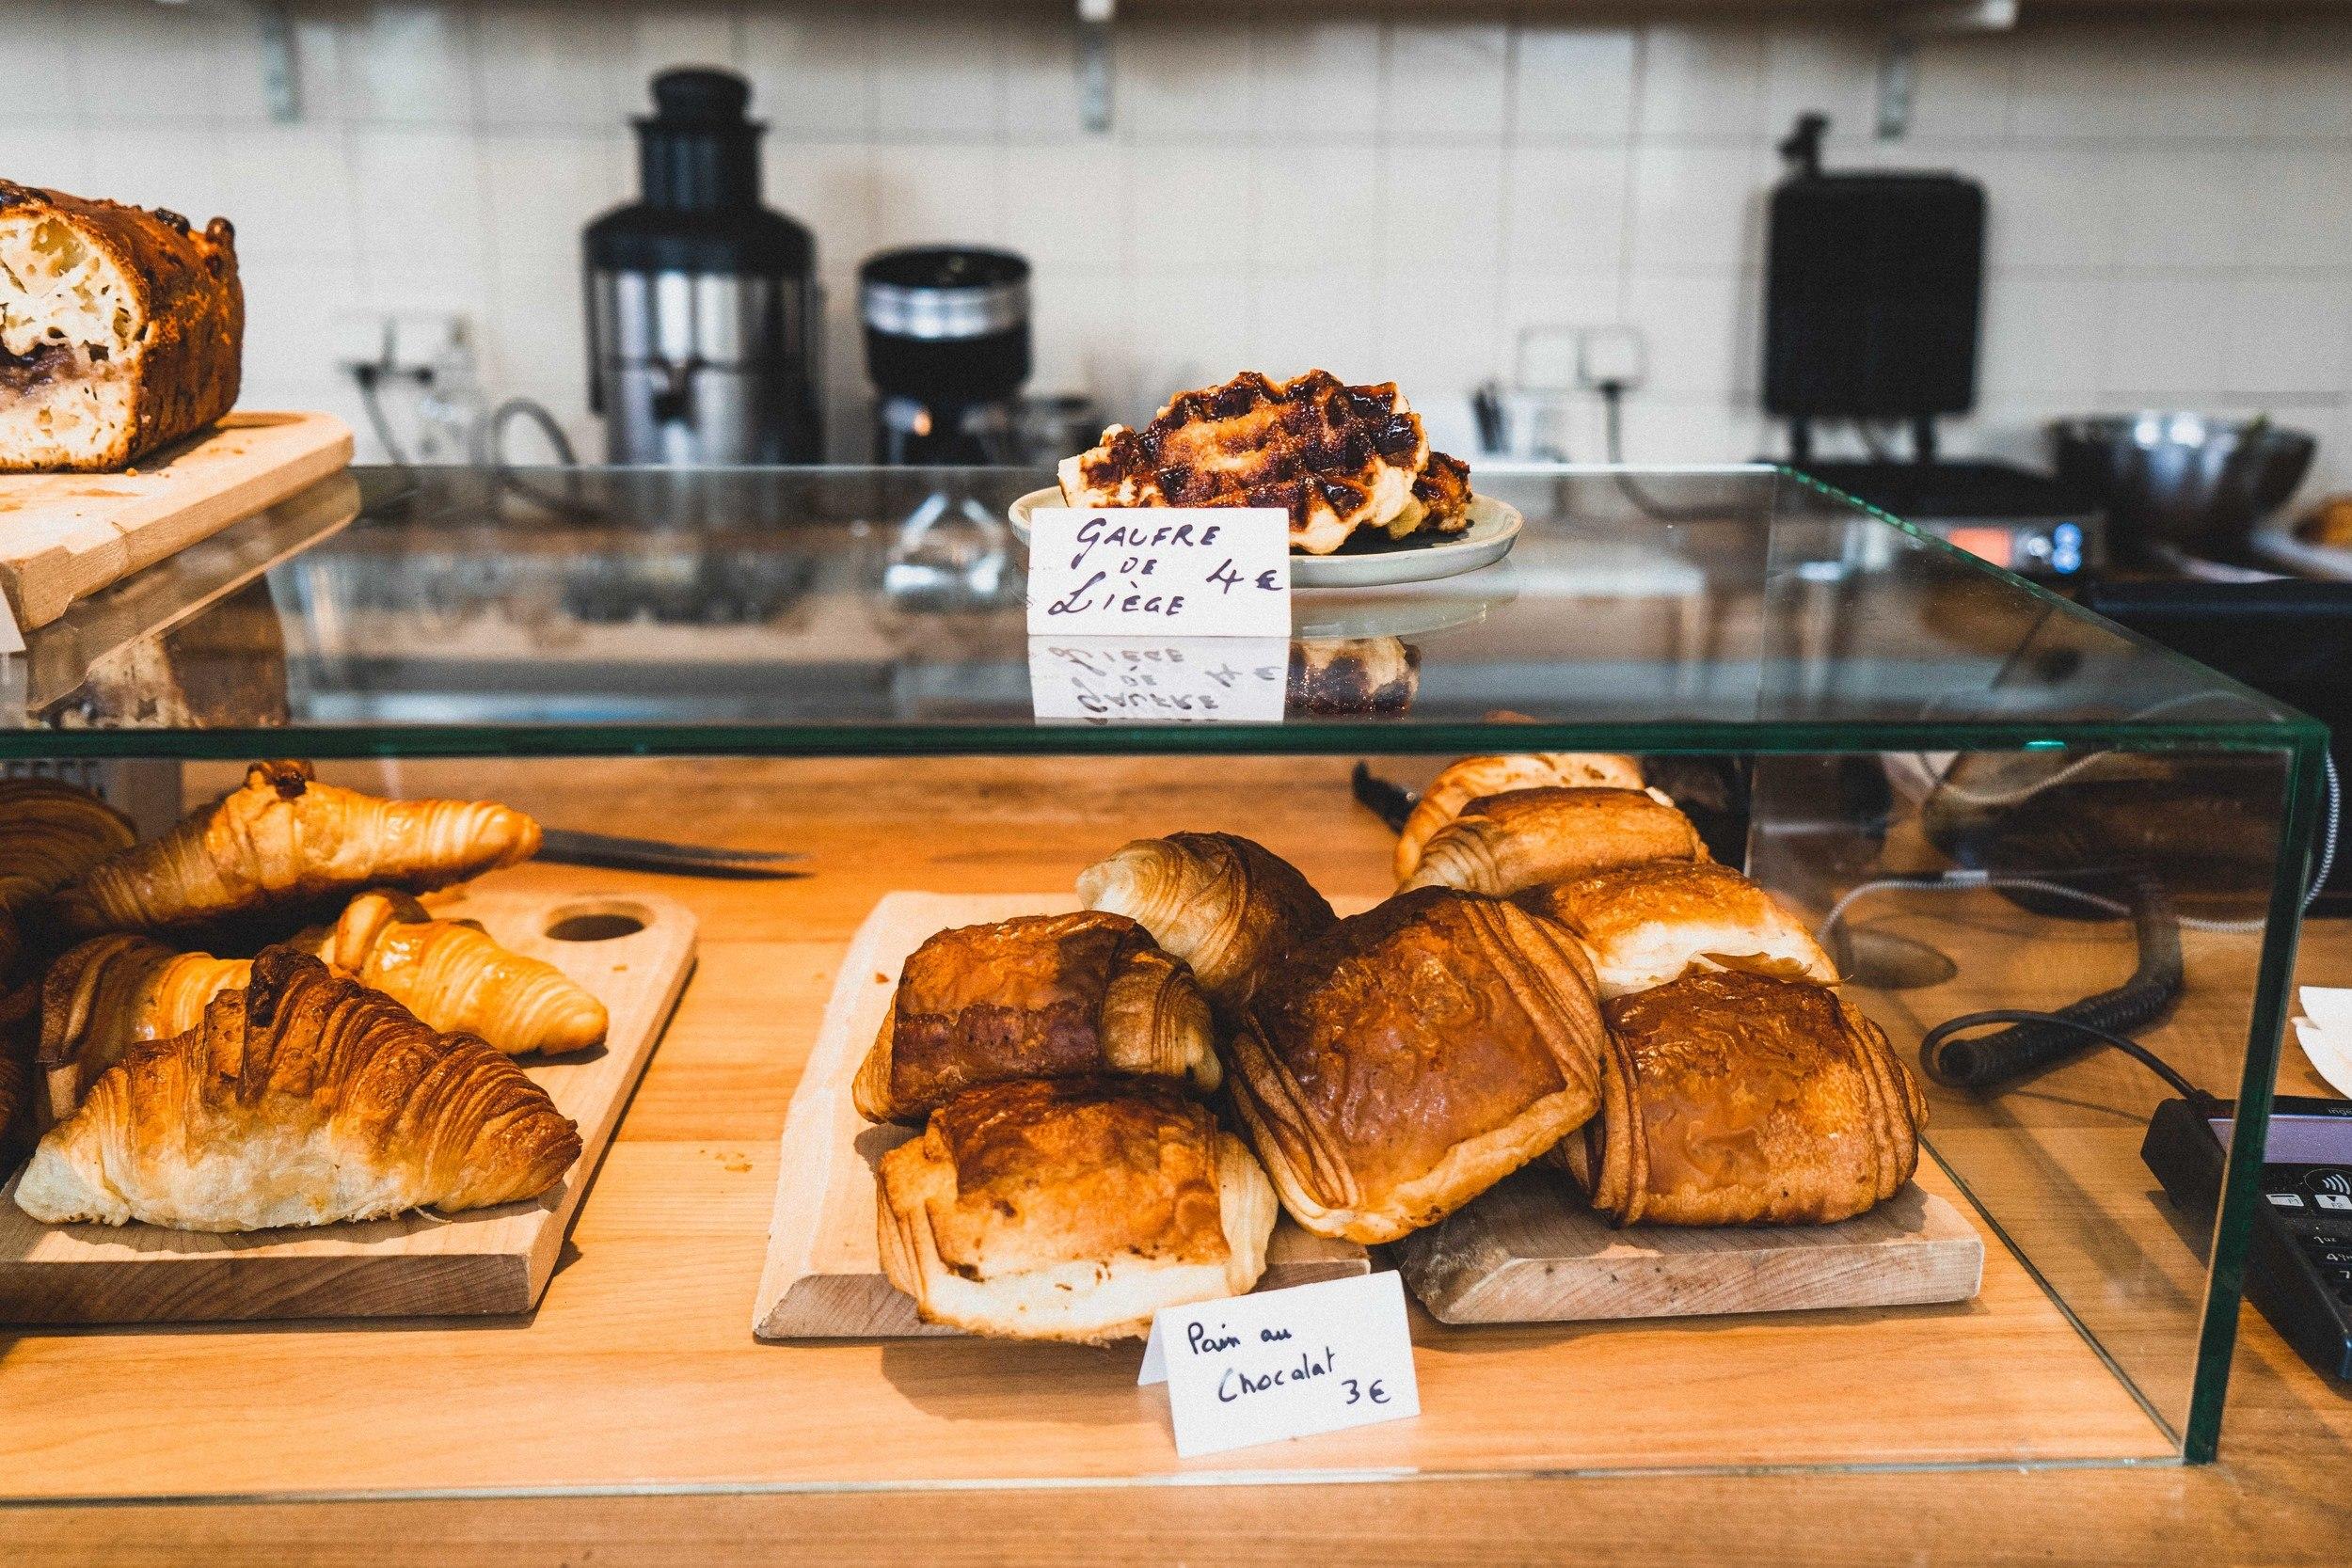 The Broken Arm Coffee Shop in Le Marais, Paris, France